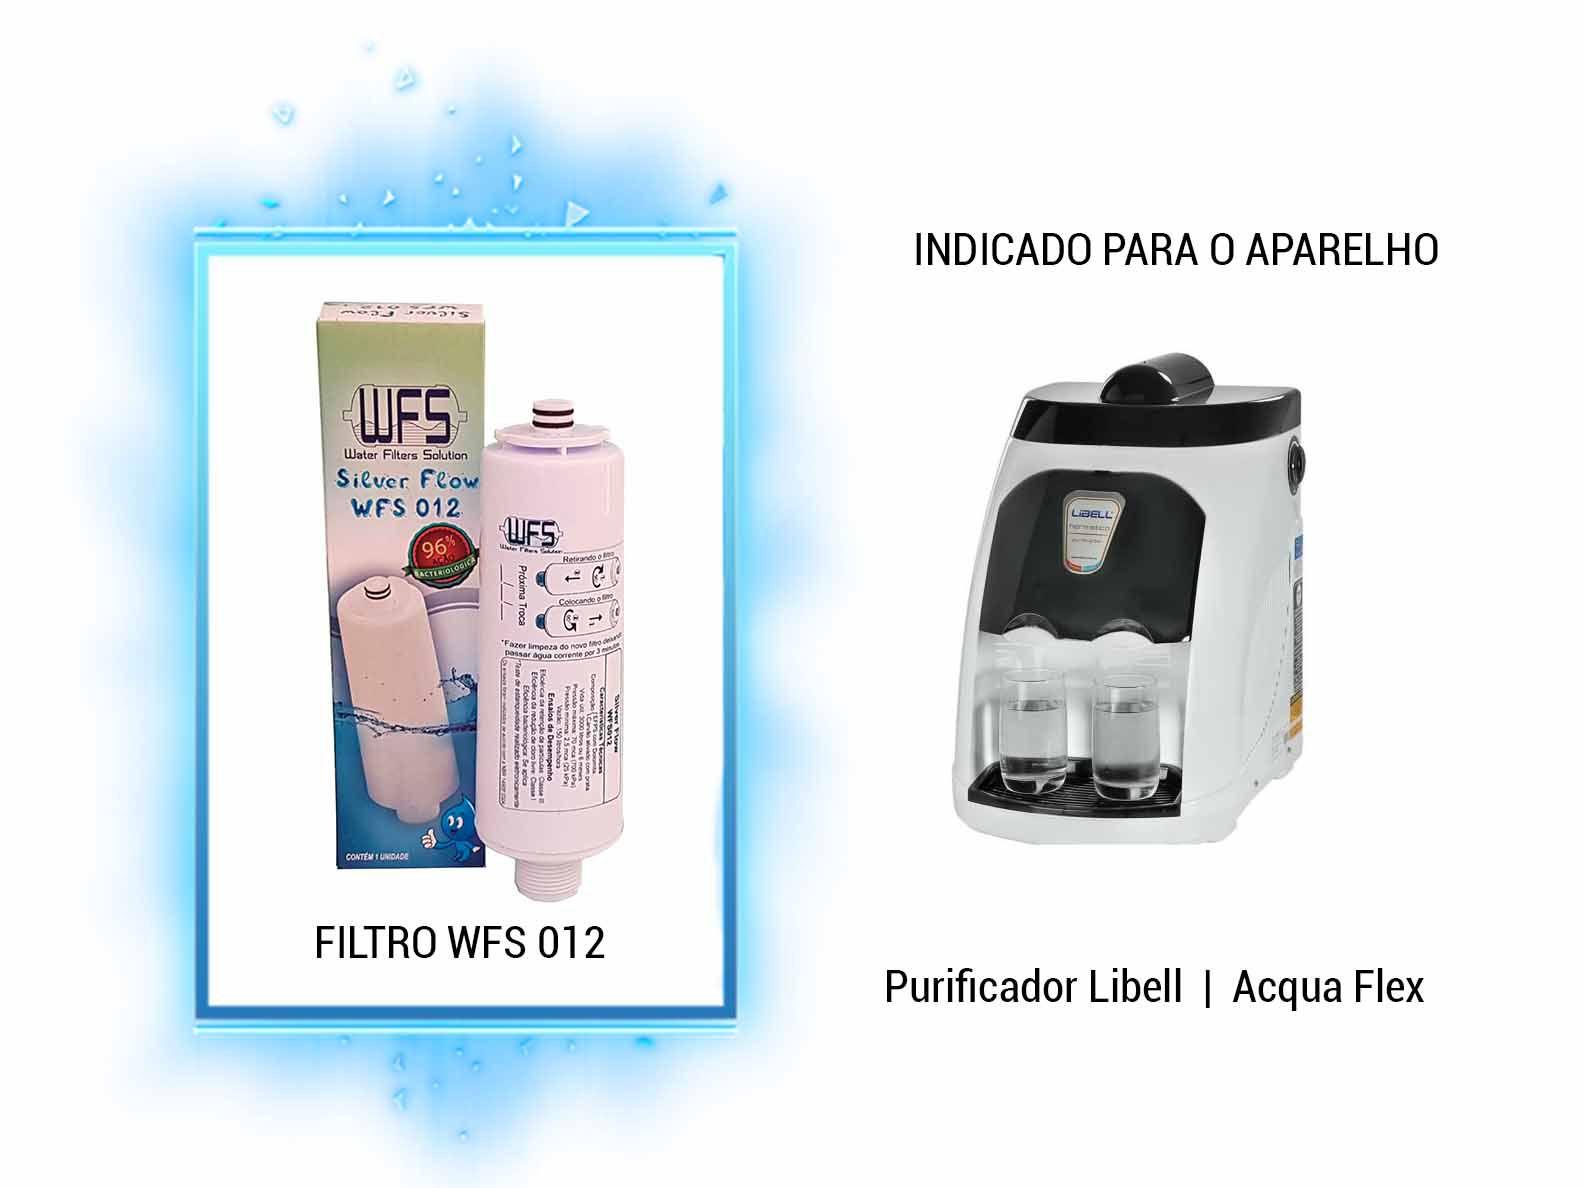 FILTRO BEBEDOURO (SILVER FLOW) LIBELL Refil Purificador Libell Wfs 012 | Silver Flow